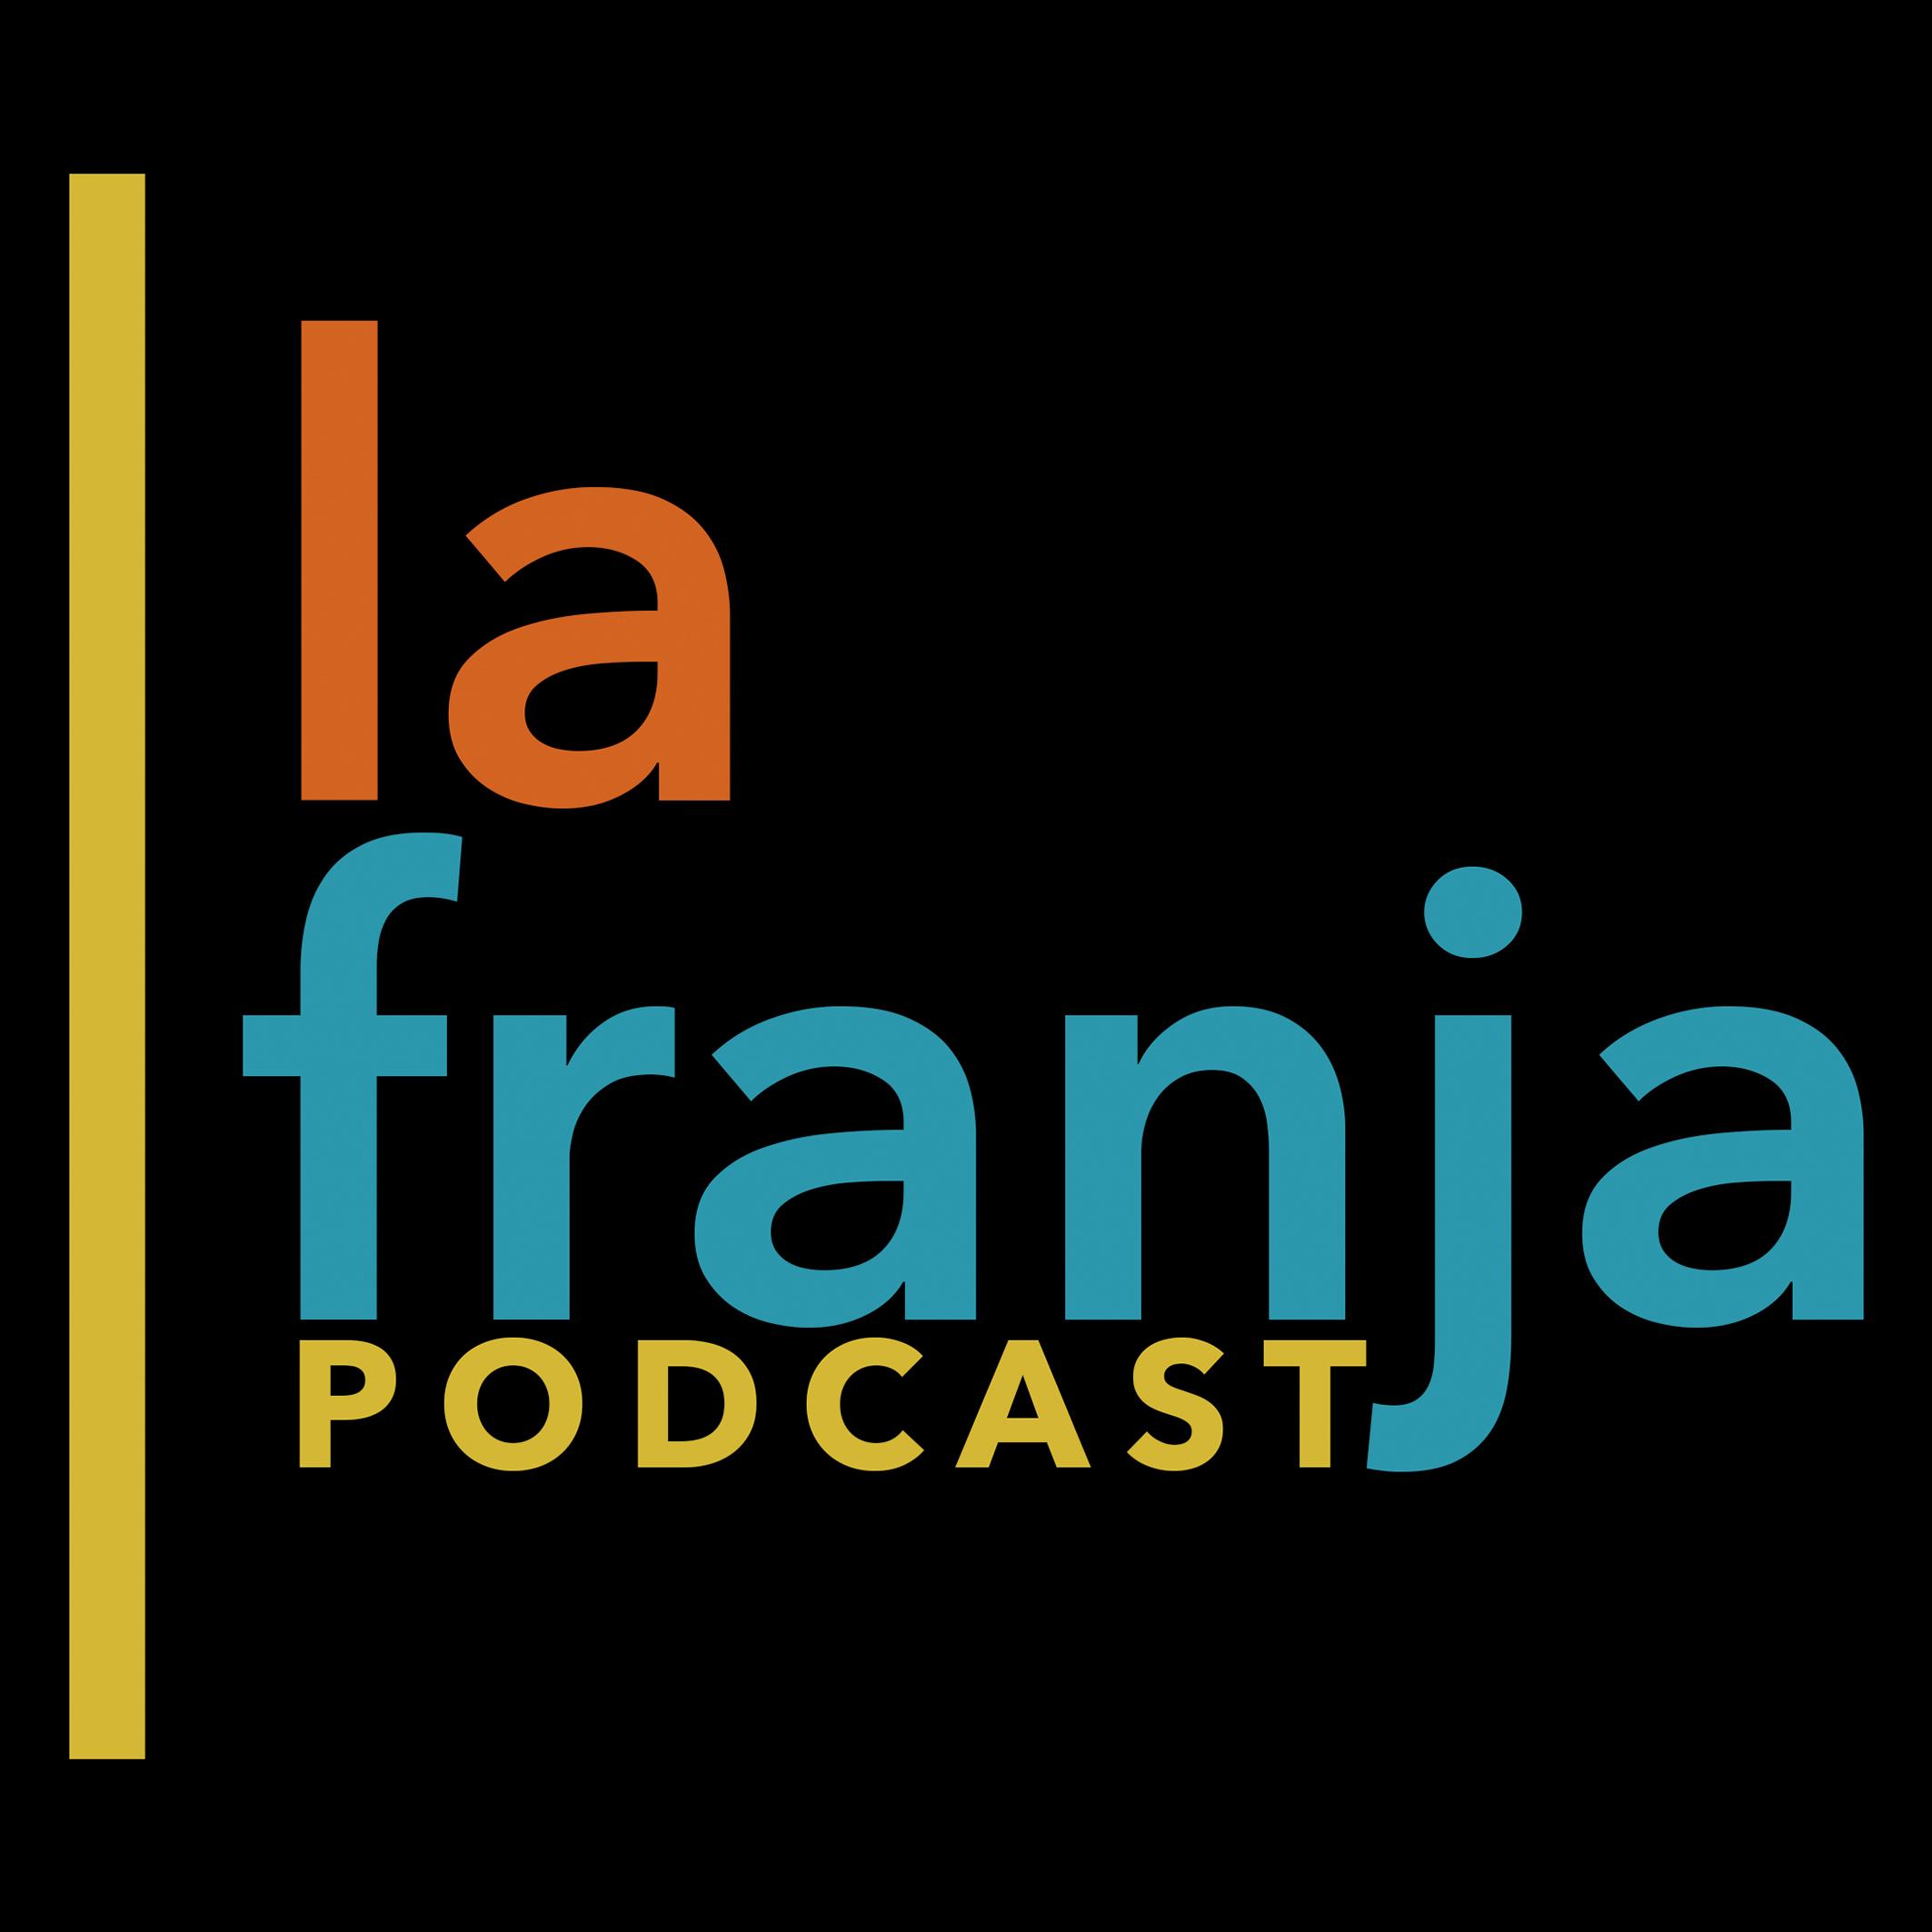 La Franja Podcast show art